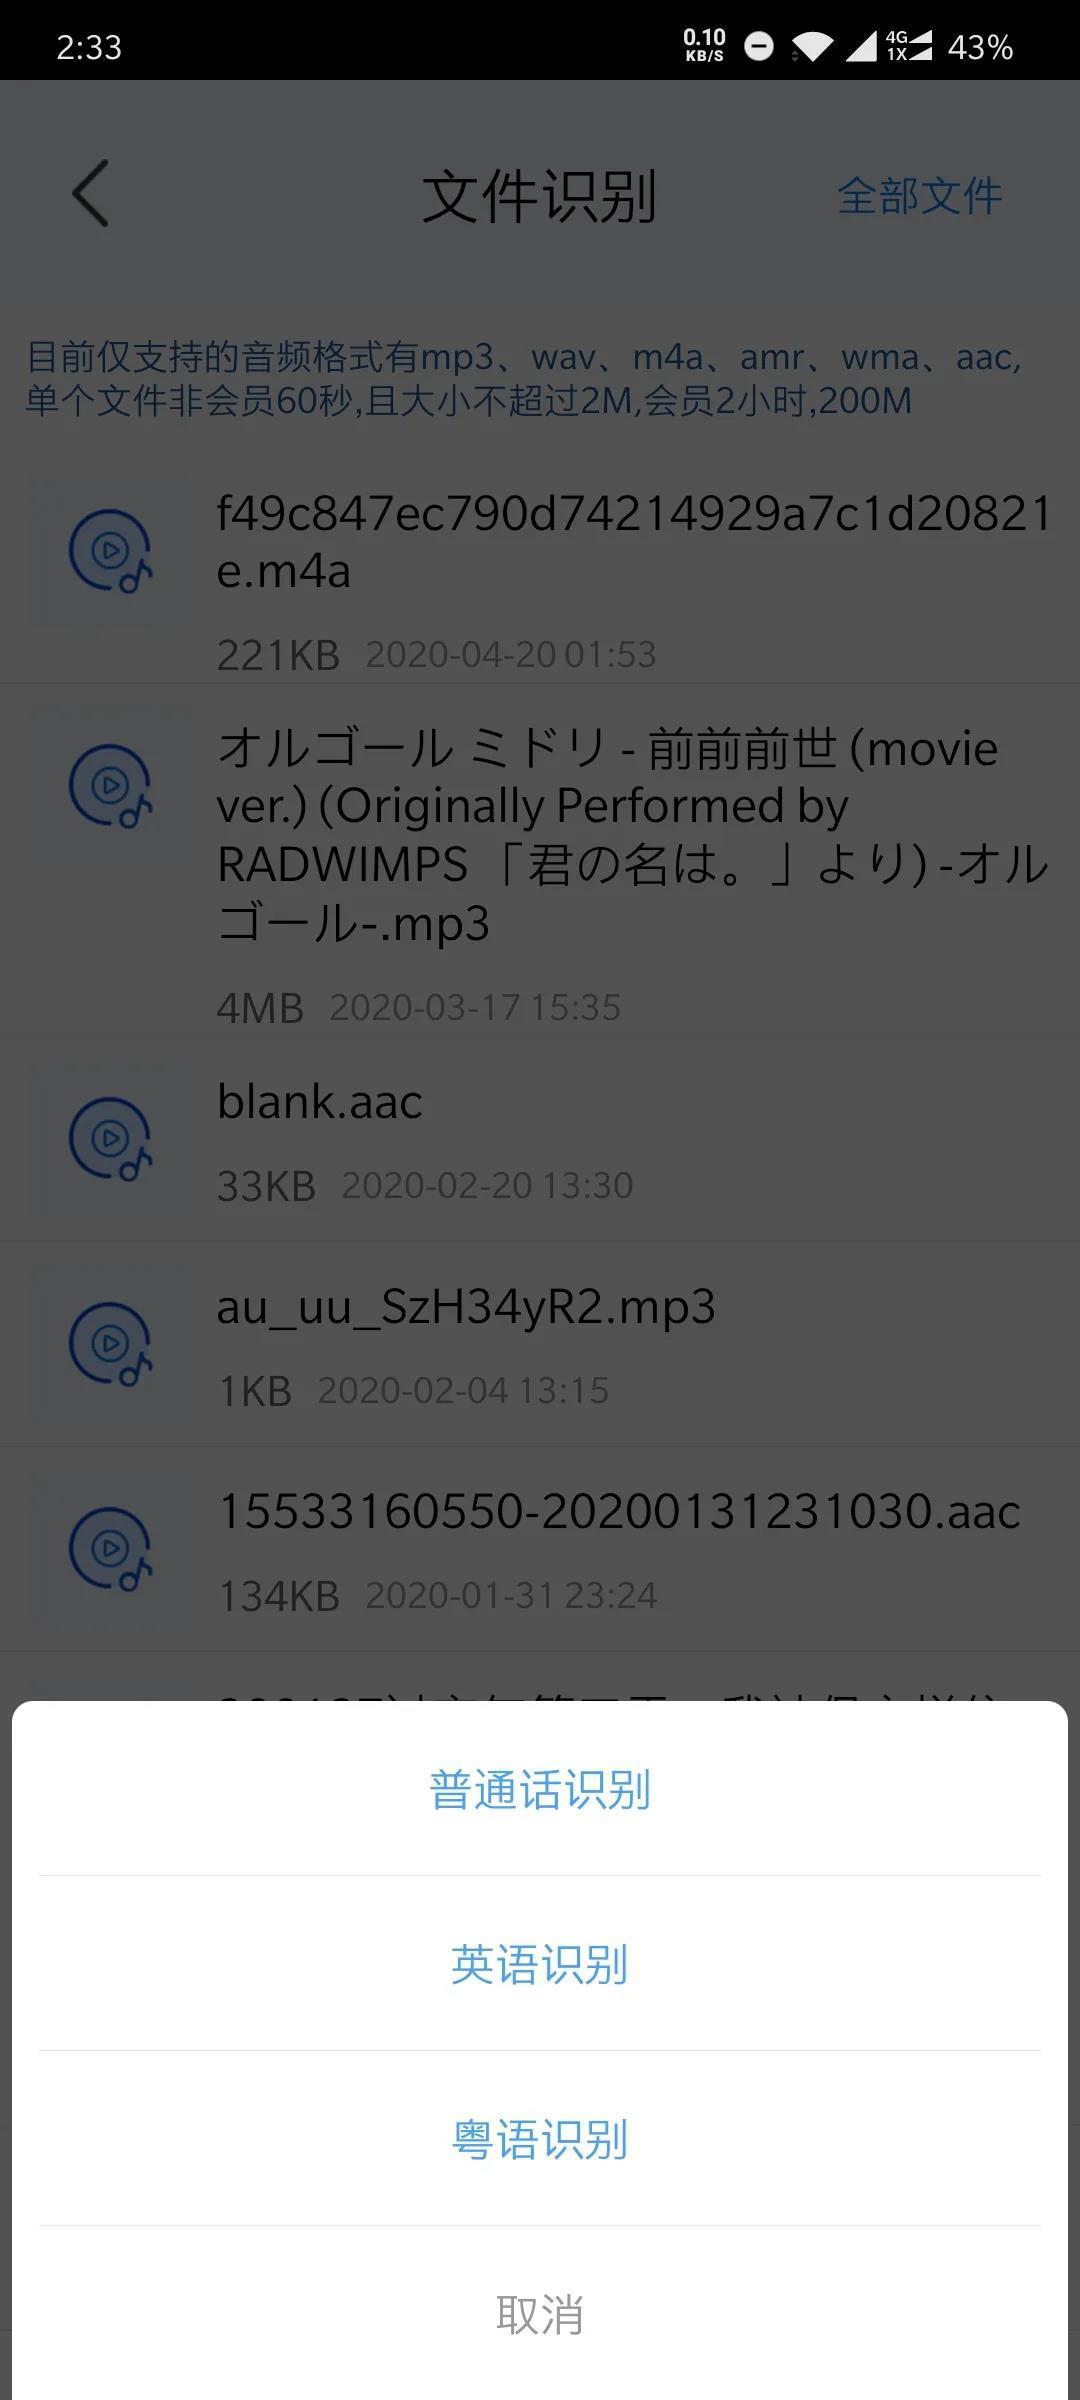 5fbb2837b18d627113d05da7 手机端语音转文字软件